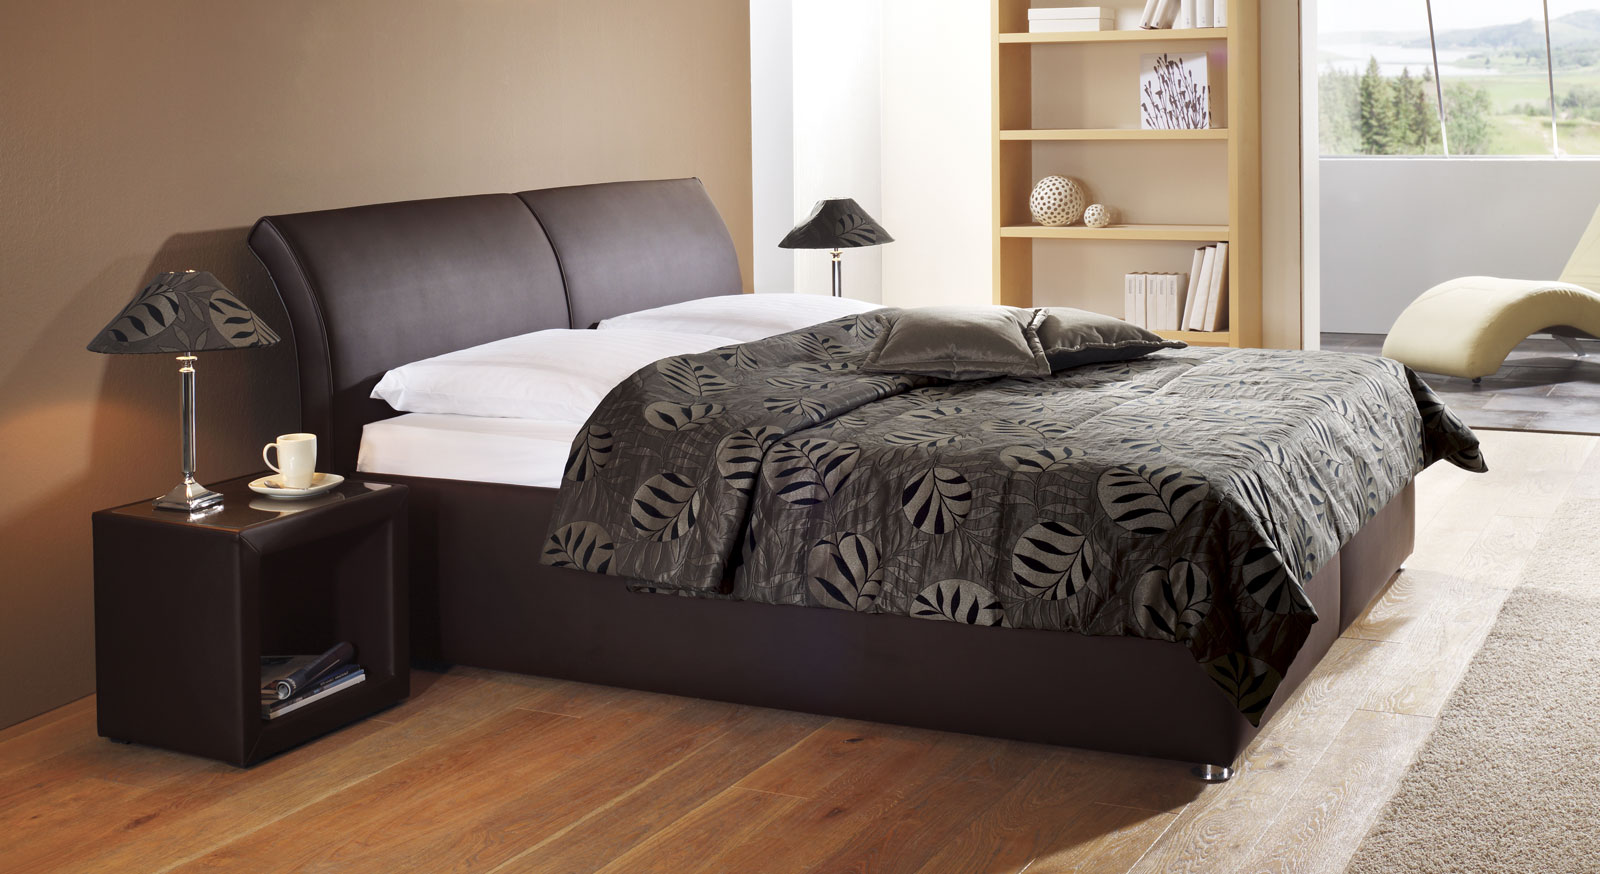 Bettgestell 180x200 hoch  Polsterbett Trapani mit Bettkasten in z. B. 180x200 cm